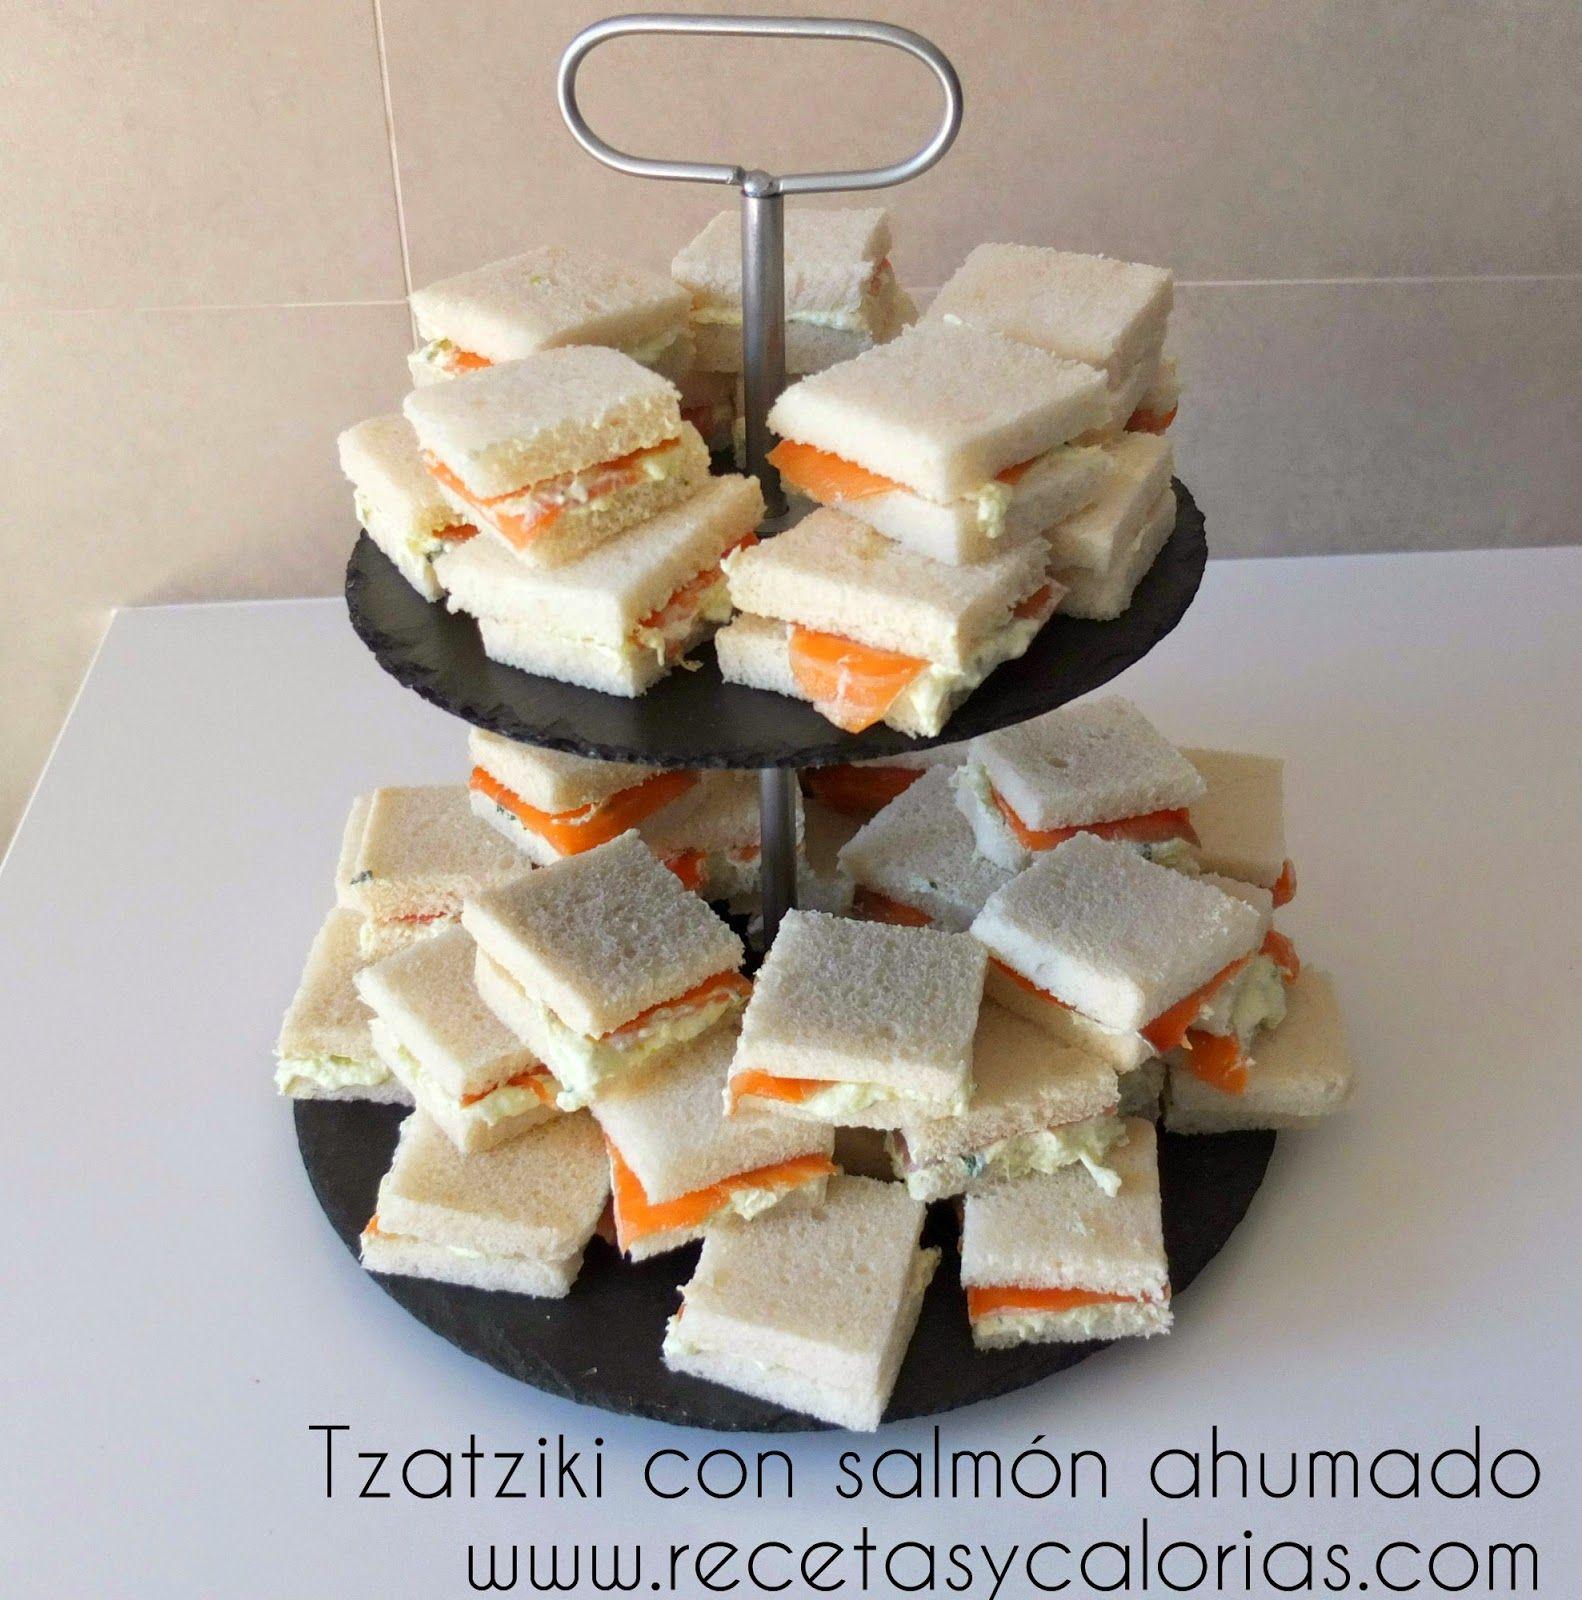 Tzatziki con salm n ahumado comidas saludables - Aperitivos de salmon ahumado ...